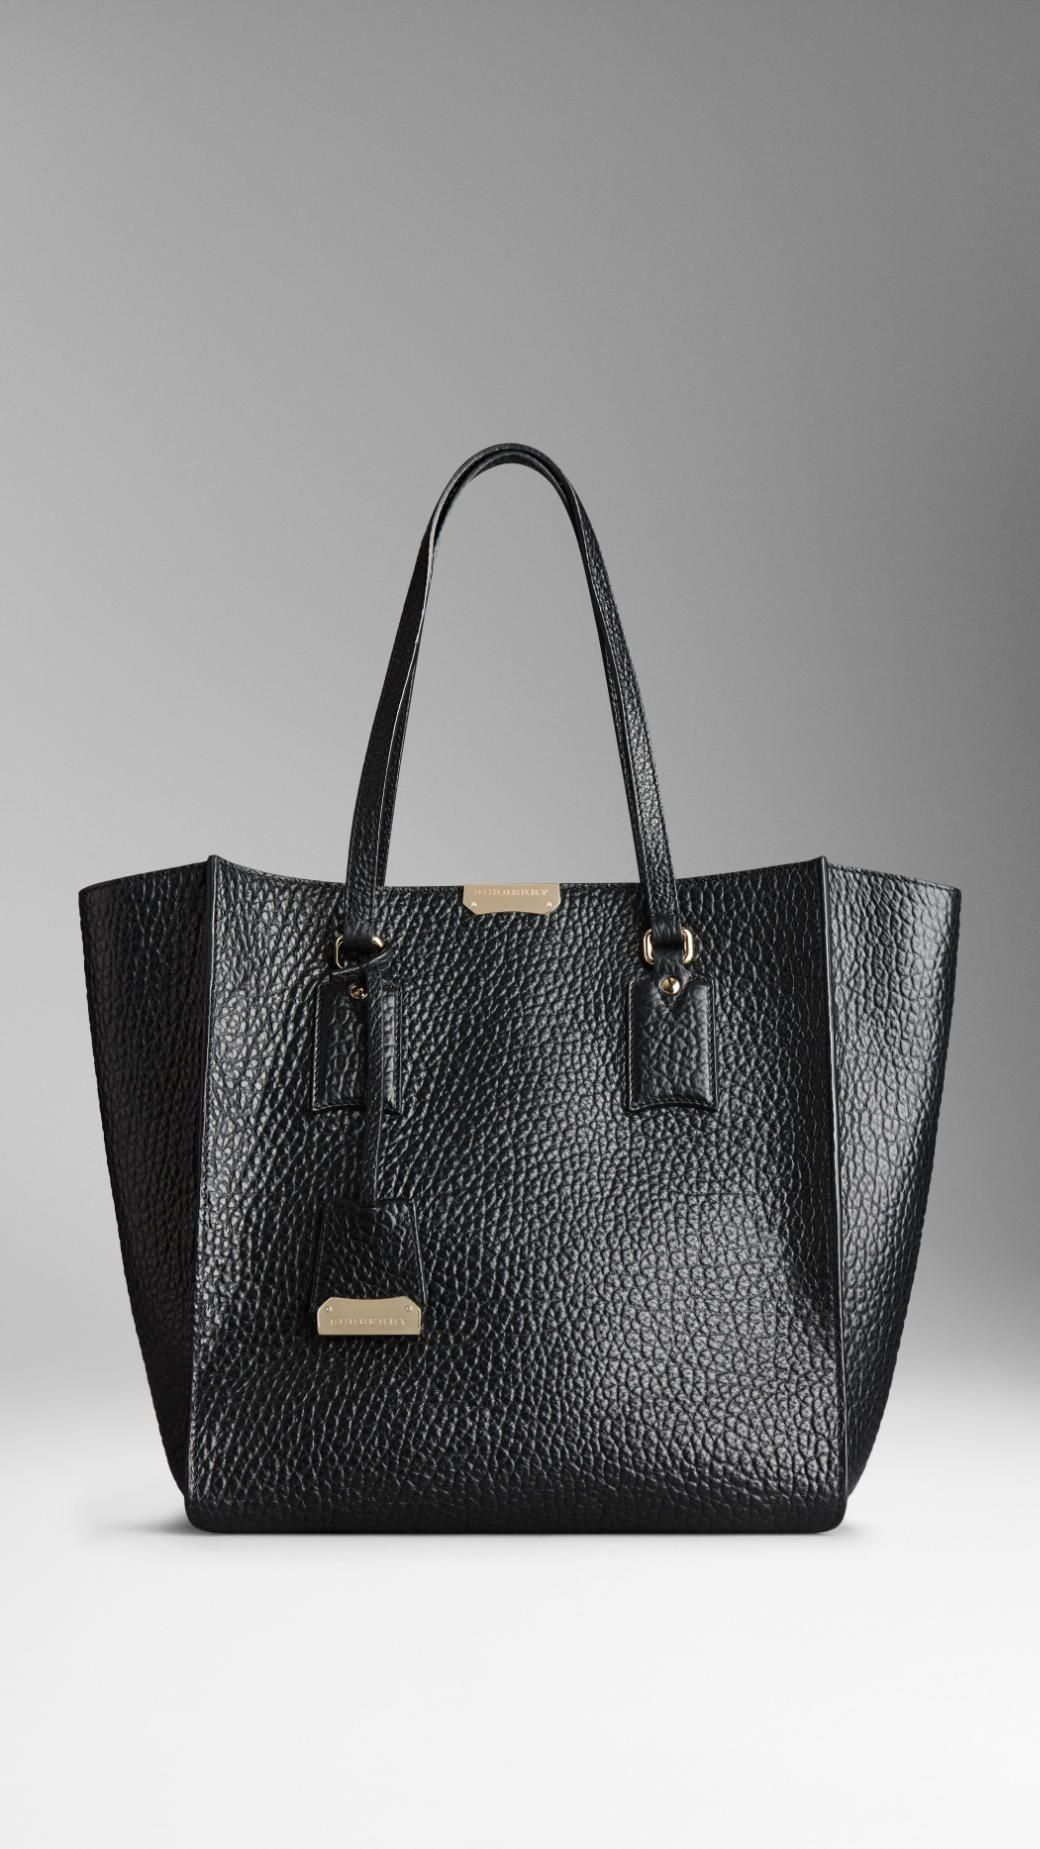 64f4d636763df7 Medium Signature Grain Leather Tote Bag | Burberry #Burberryhandbags ...